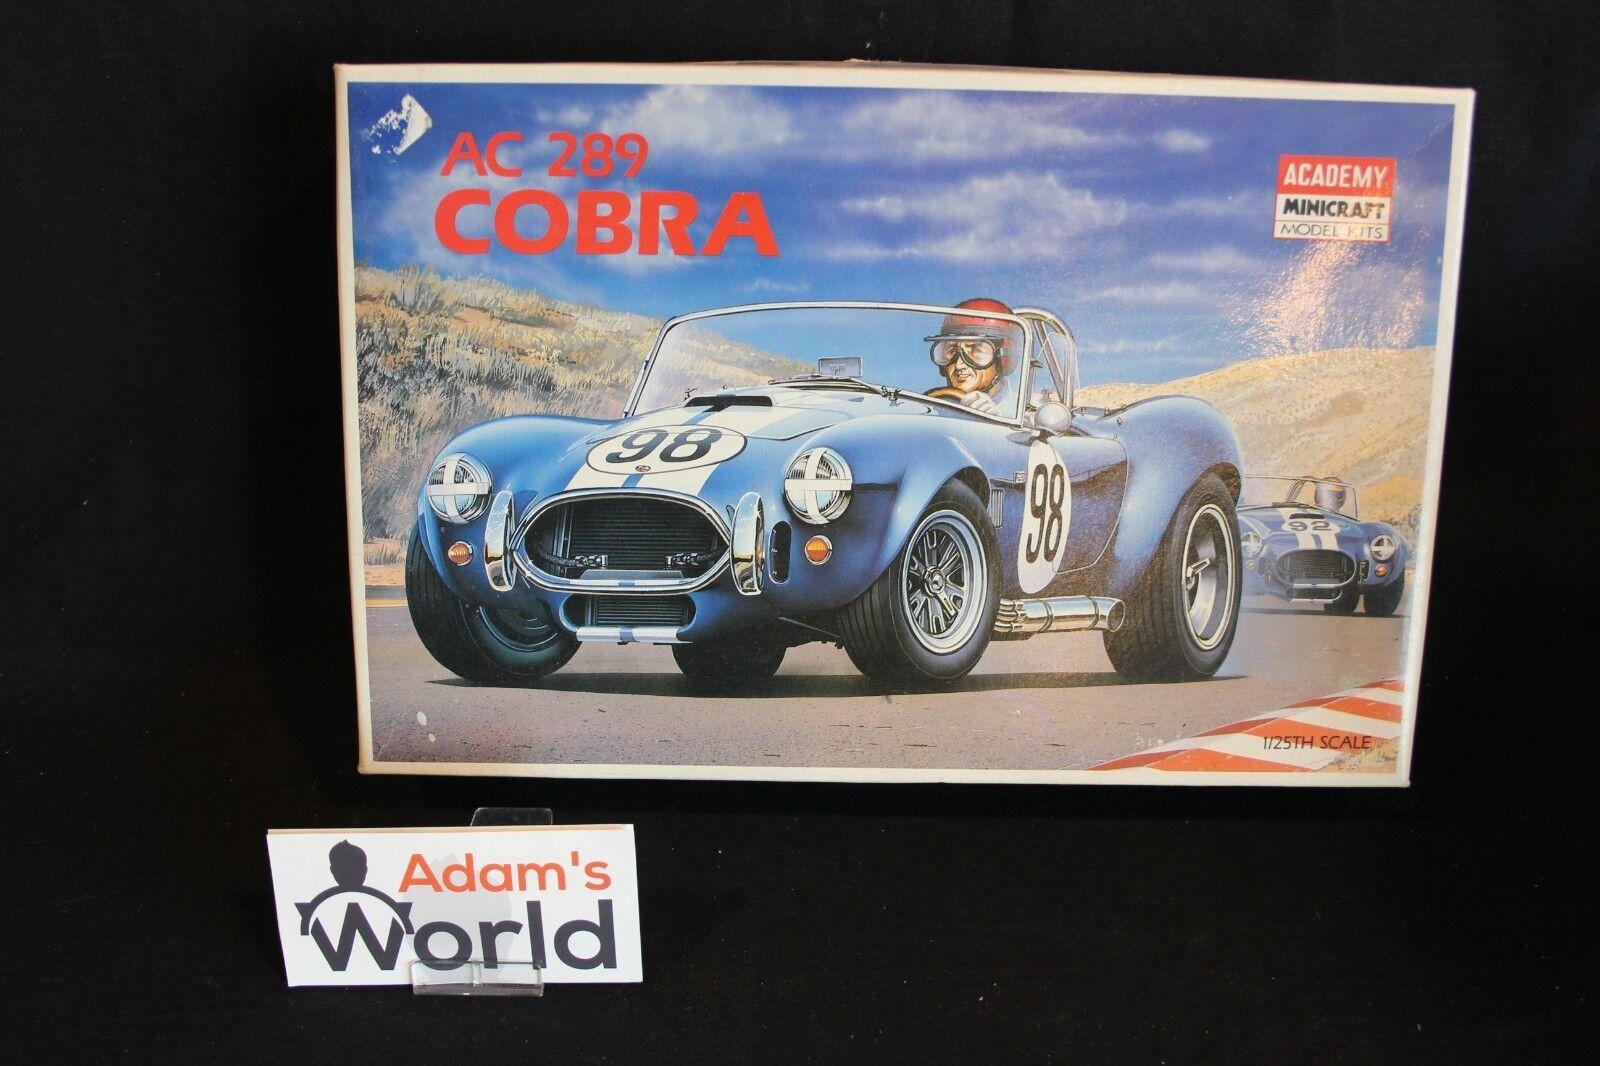 Akademie minicraft kit ac cobra 289 1  25   98 blau   weiß (mg1)